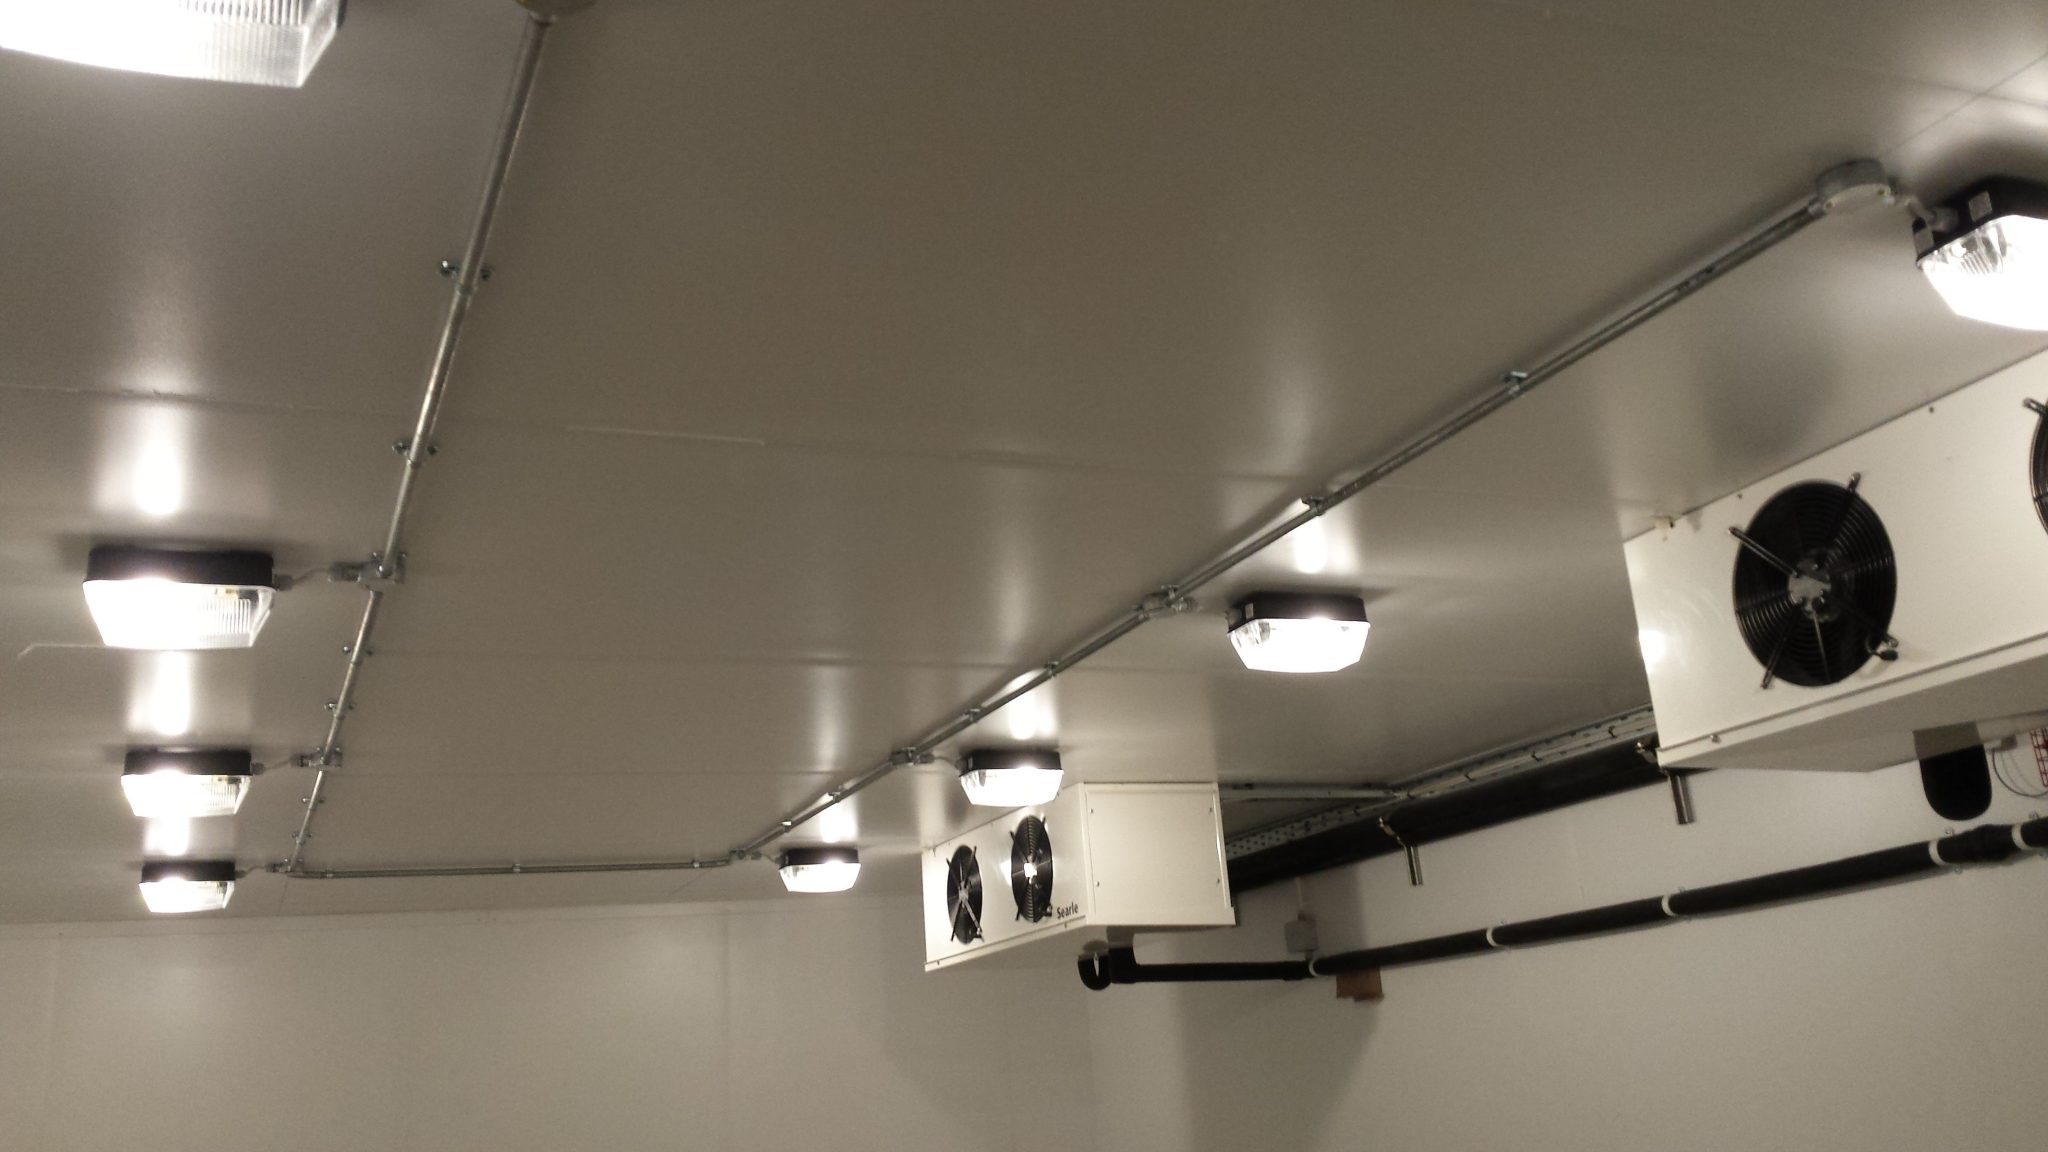 Evaporator freezer